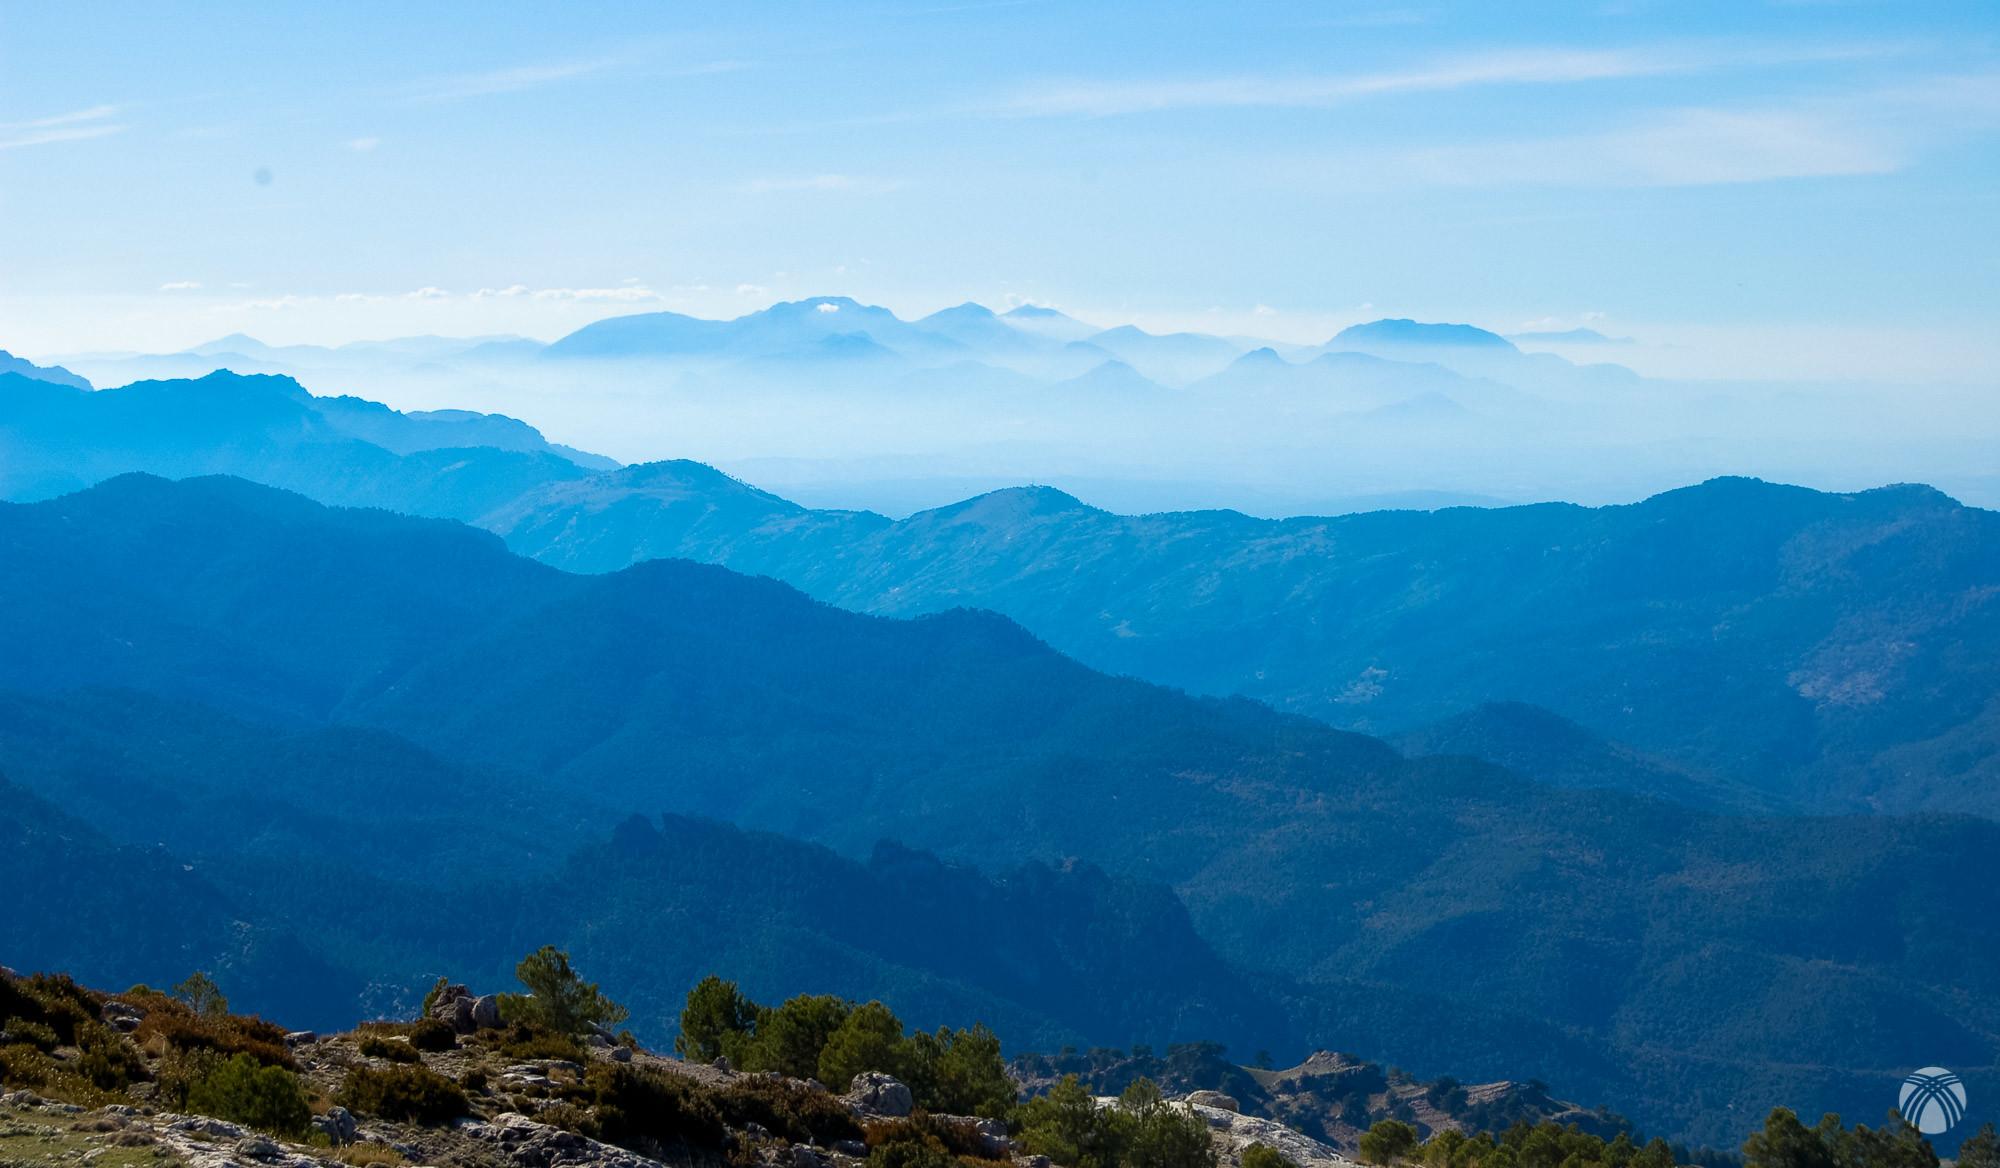 Tirando de zoom podemos ver Sierra Mágina